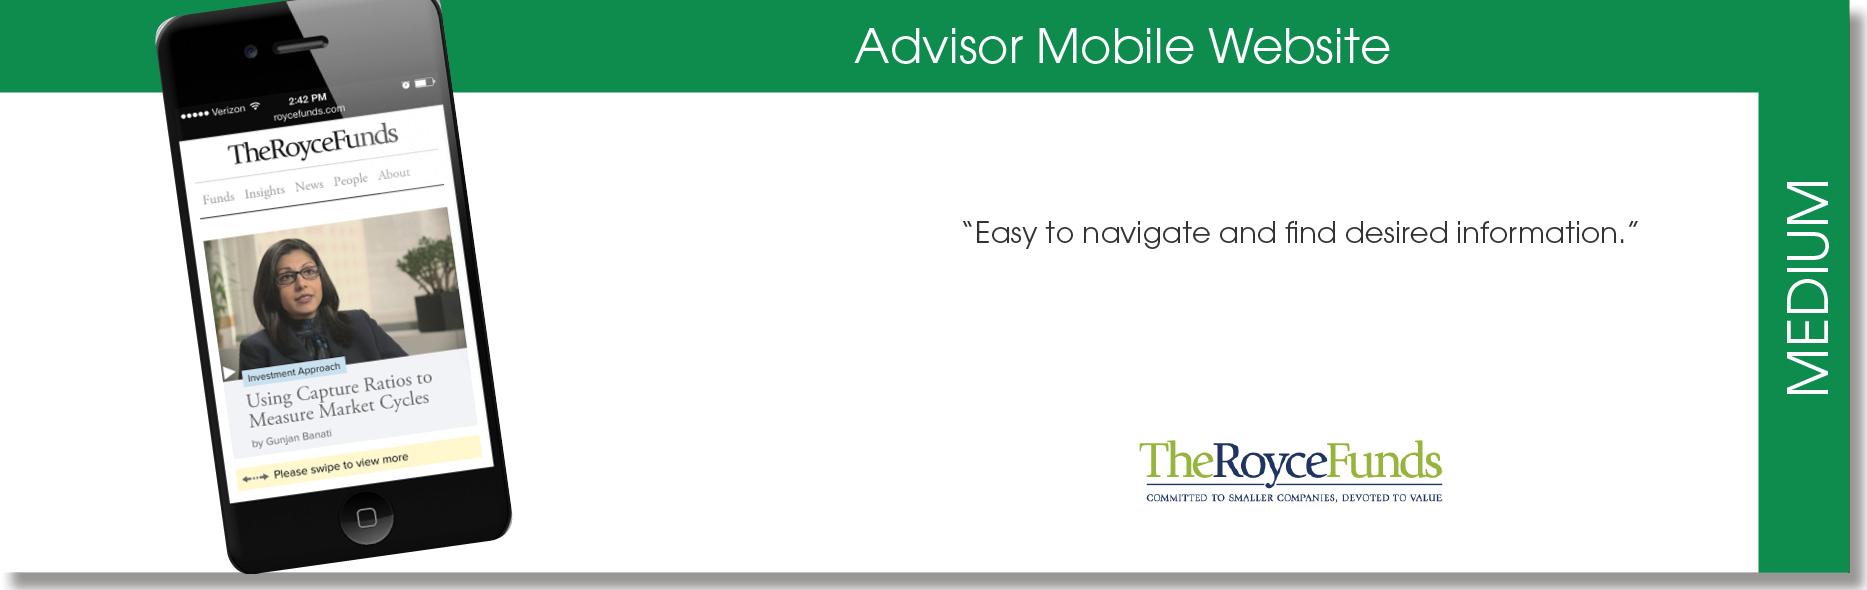 Medium Advisor Winner Image11